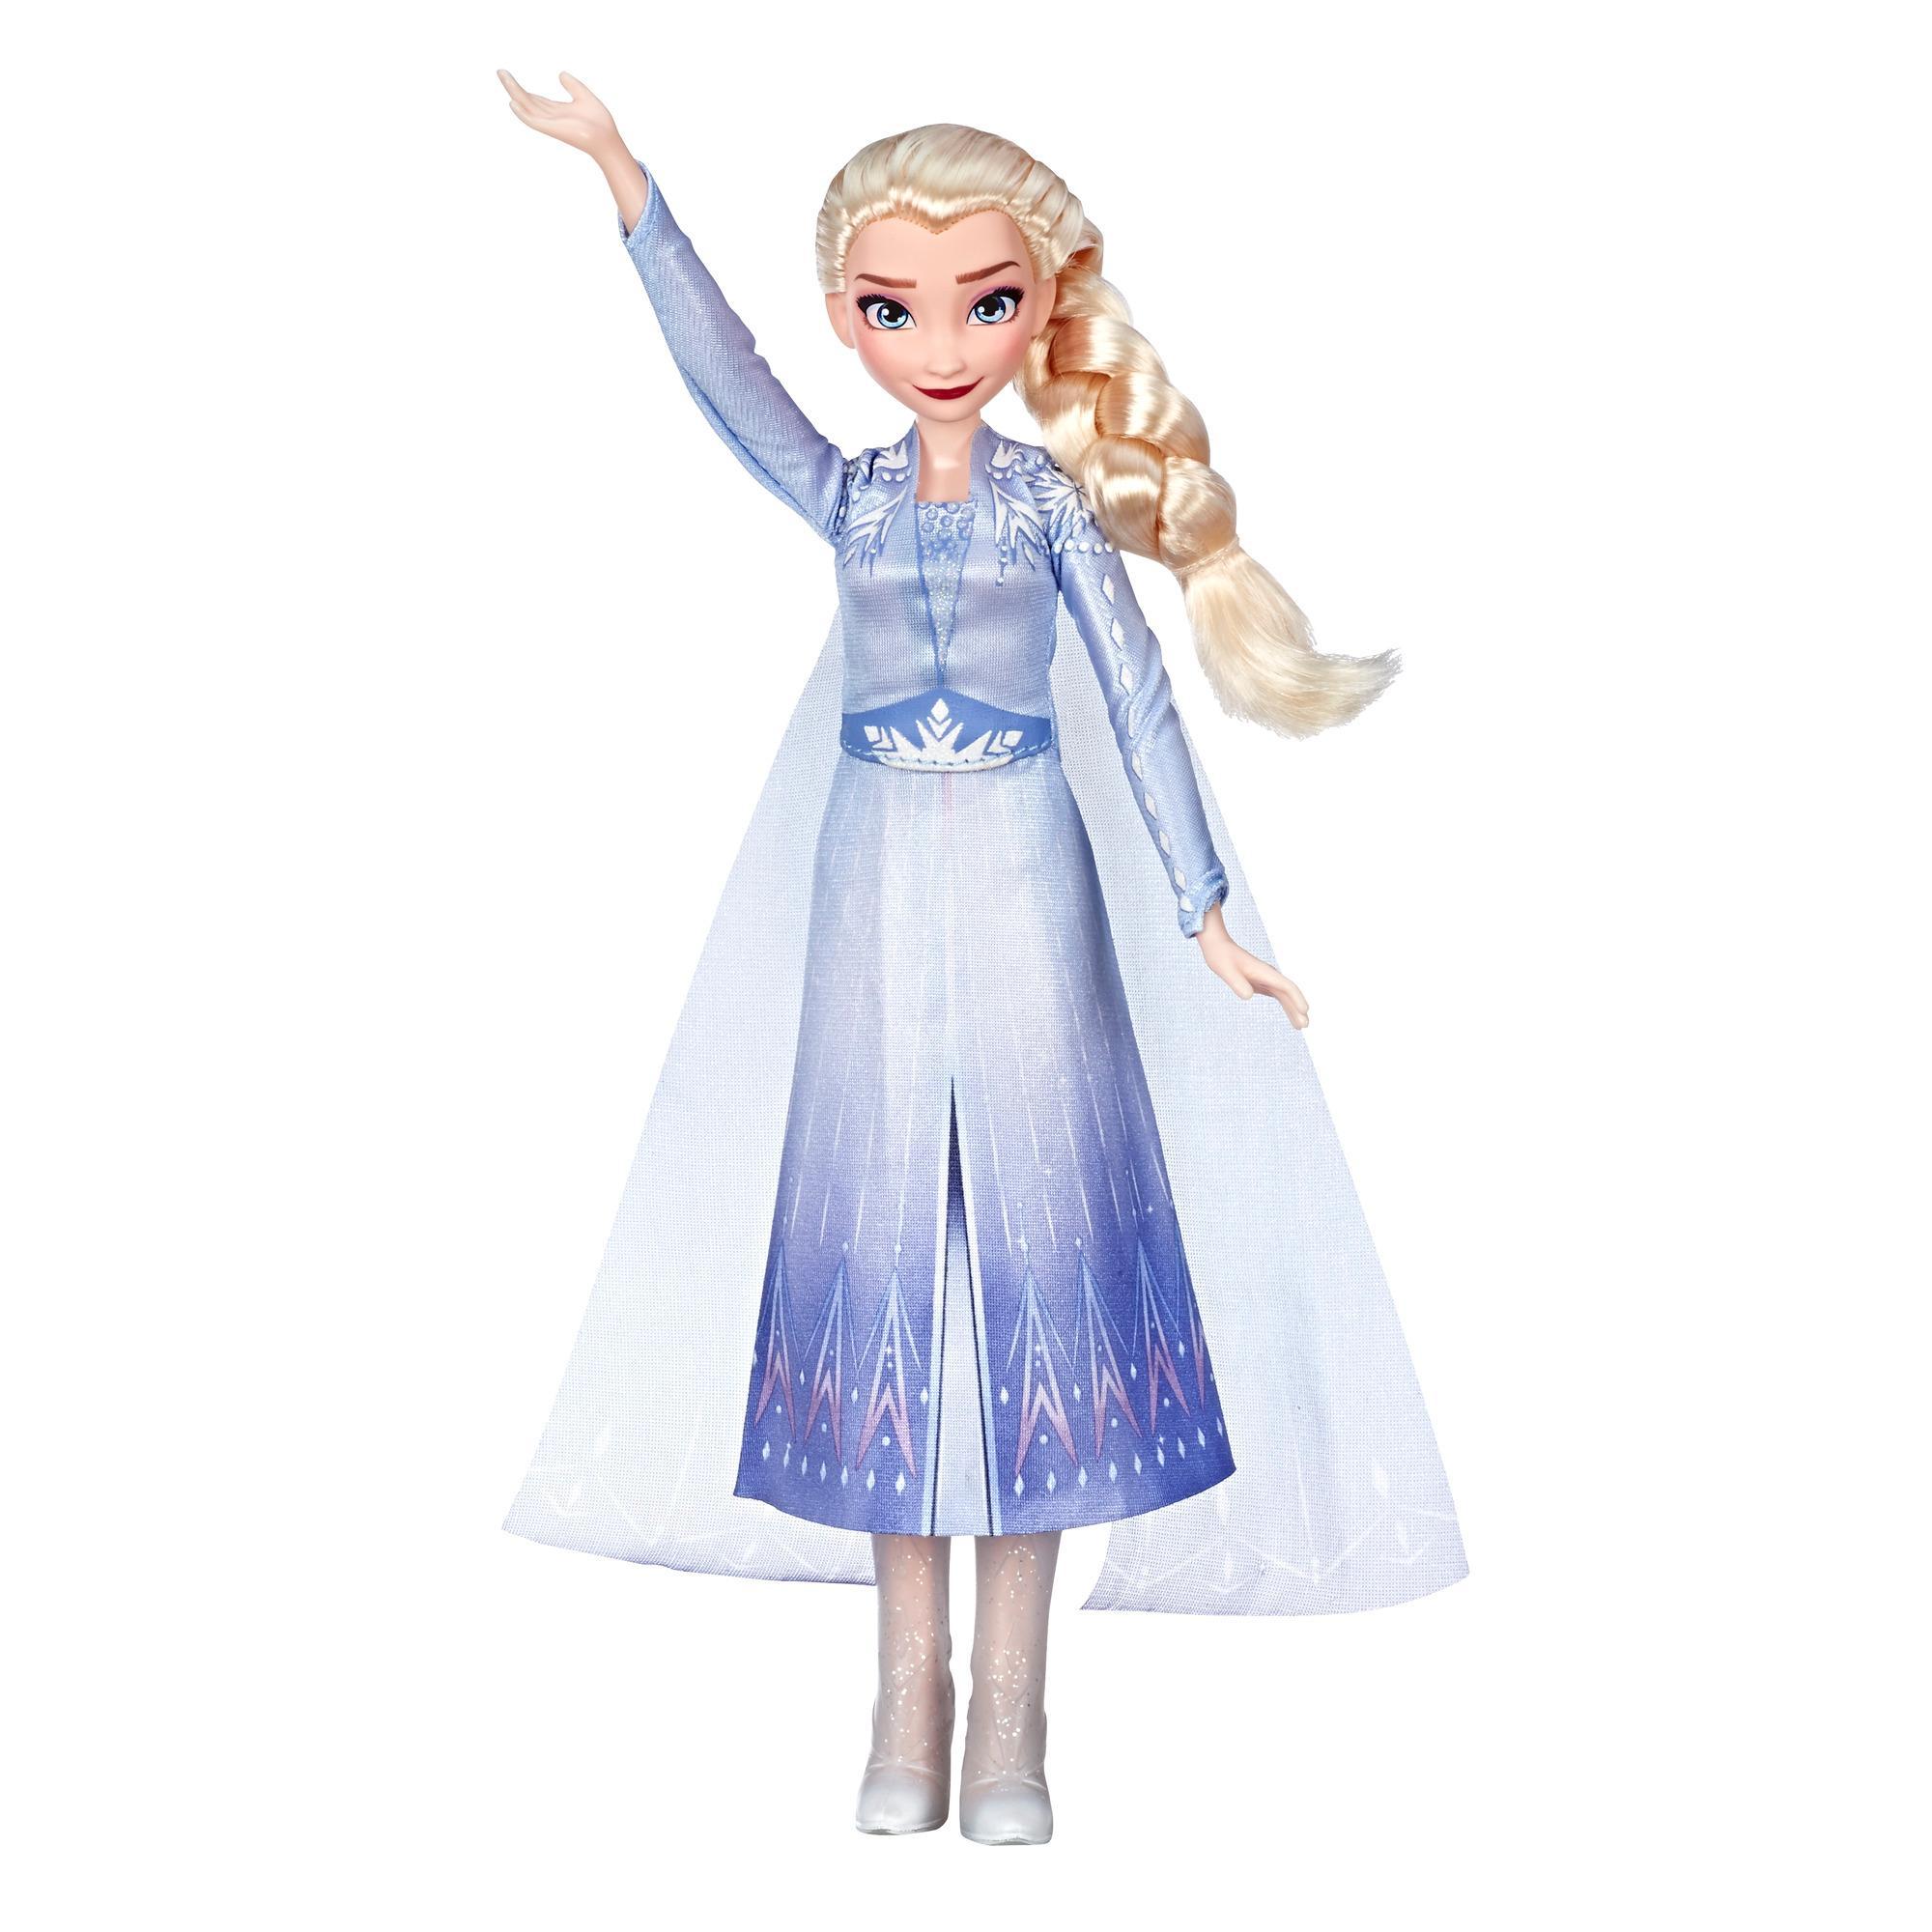 Disney Frozen - Elsa cantante - Muñeca que canta; lleva un vestido azul inspirado en Frozen 2 de Disney